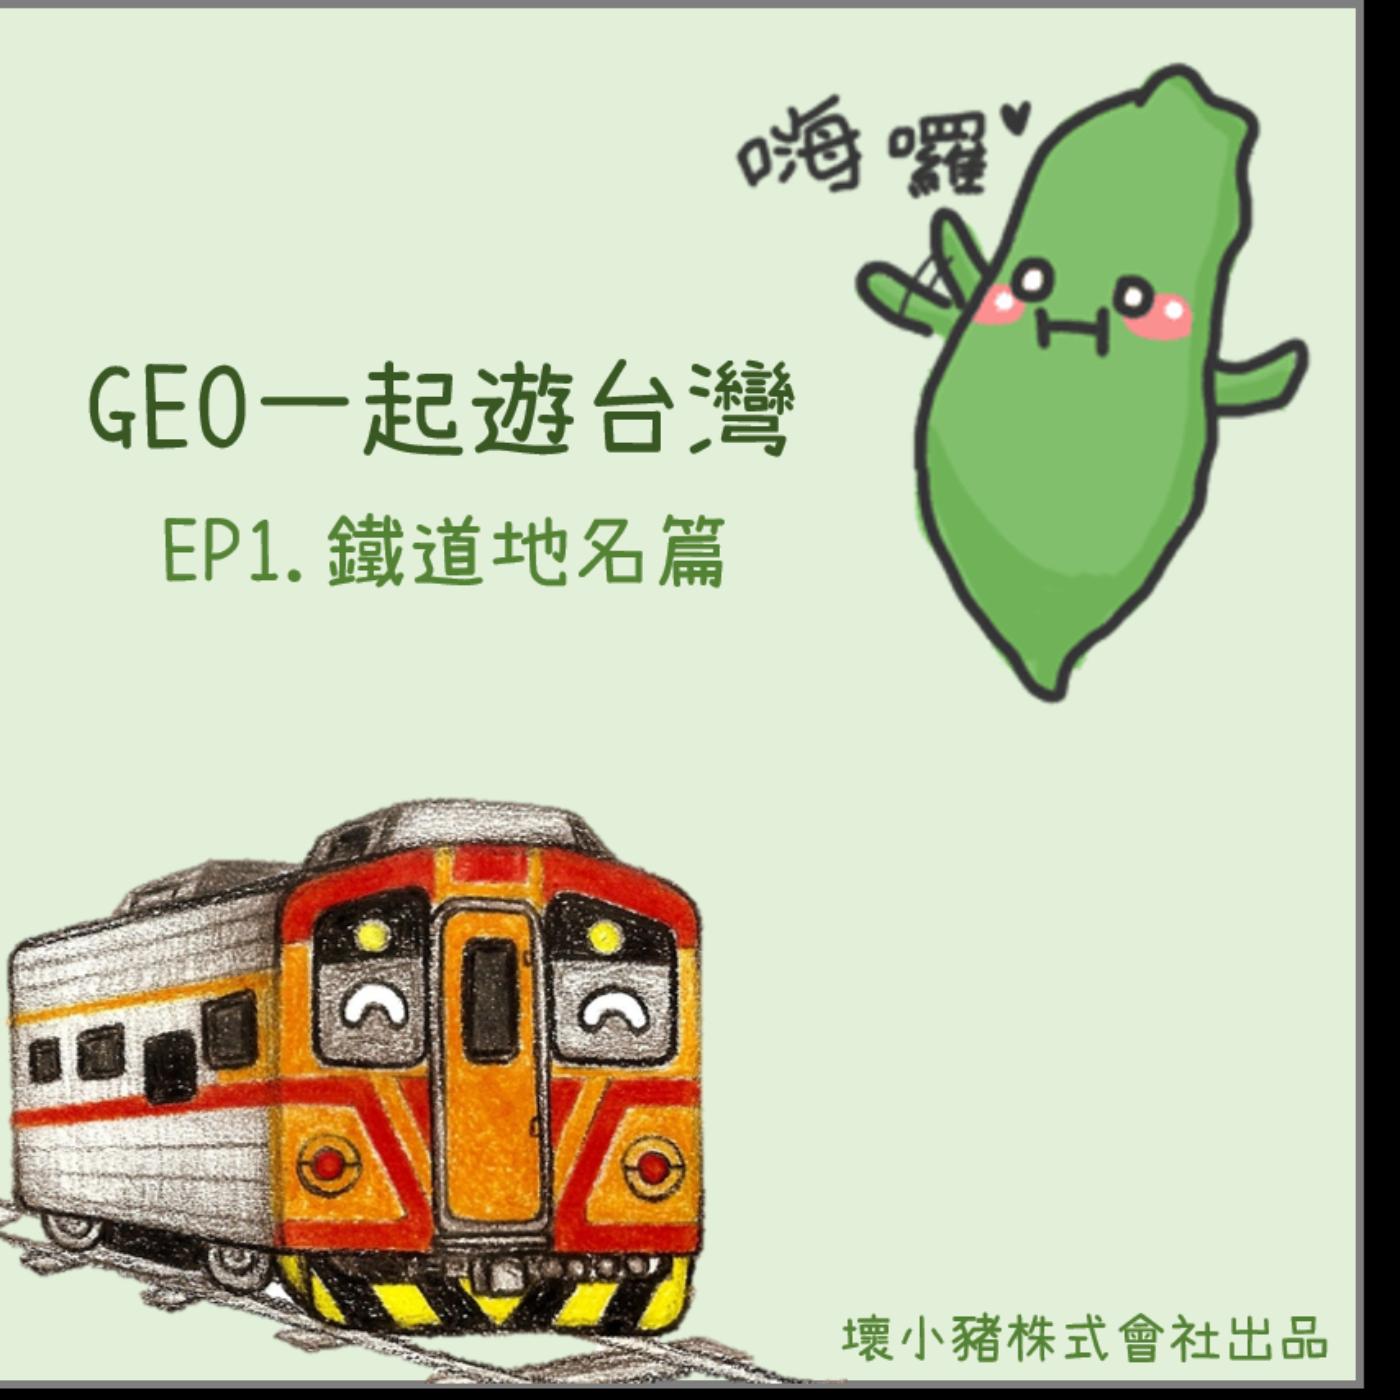 GEO一起遊台灣